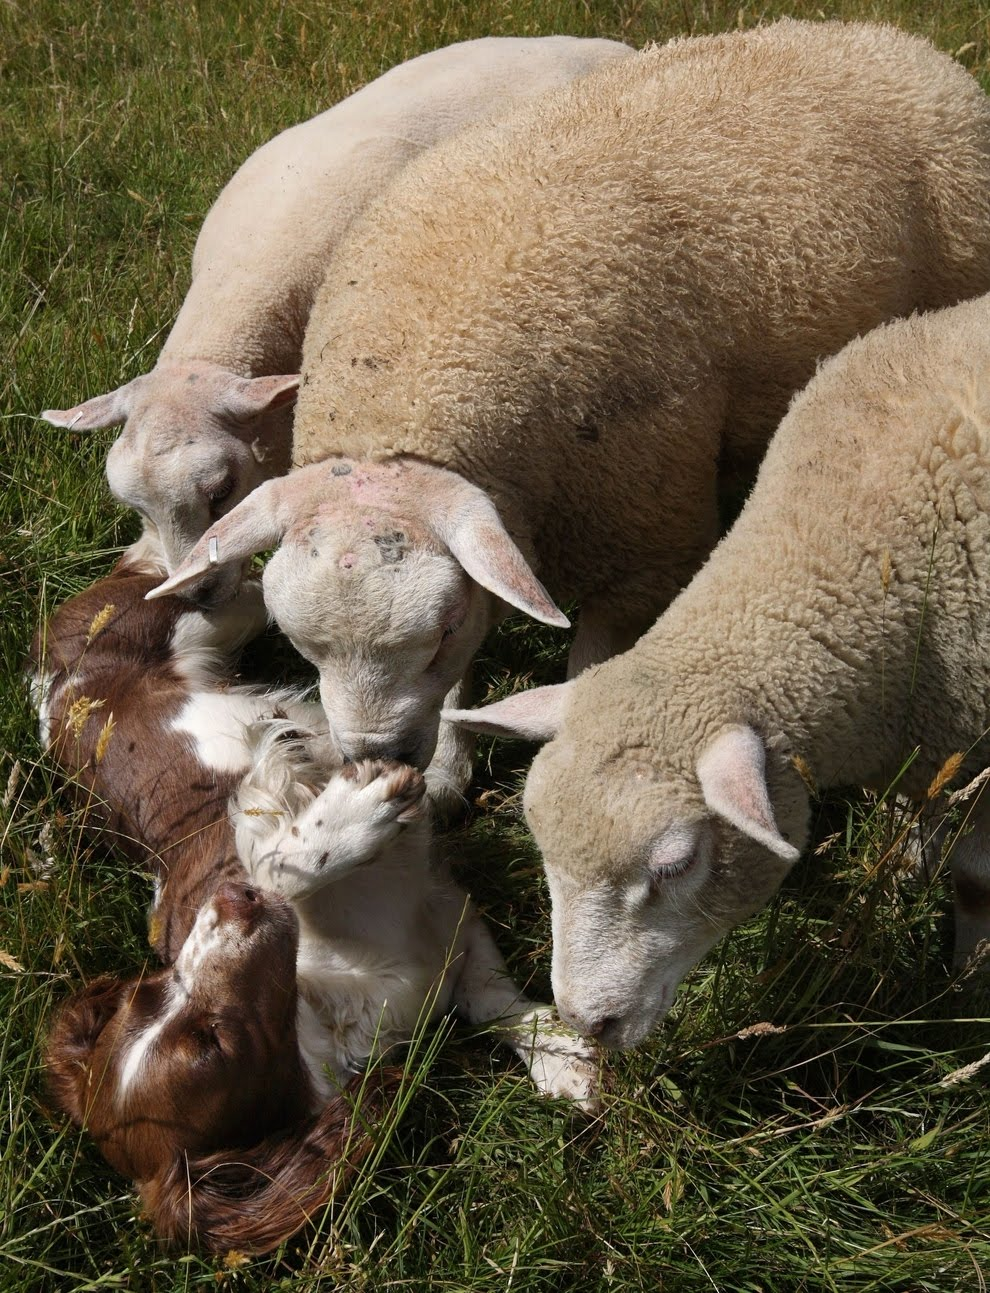 A sheepdog bottle-feeding baby lamb, Thank you Jess